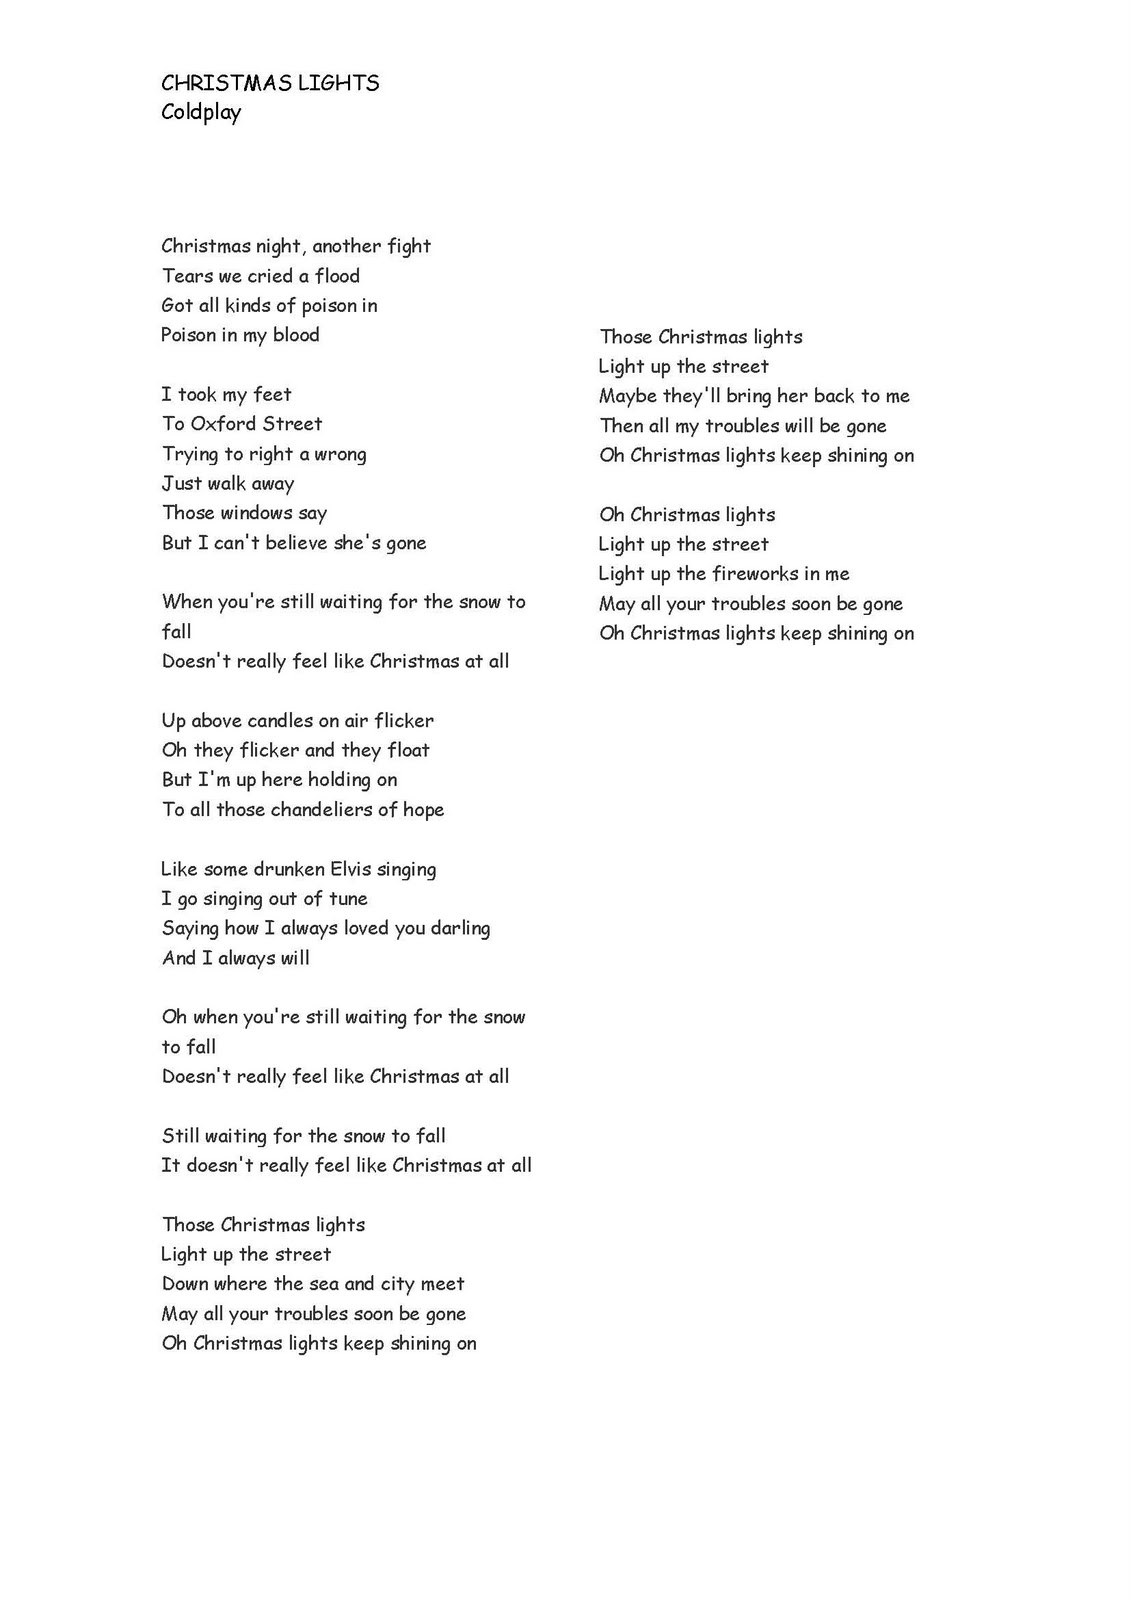 CHRISTMAS LIGHTS Coldplay (lyrics) (A SONG) | andtenmaenglish